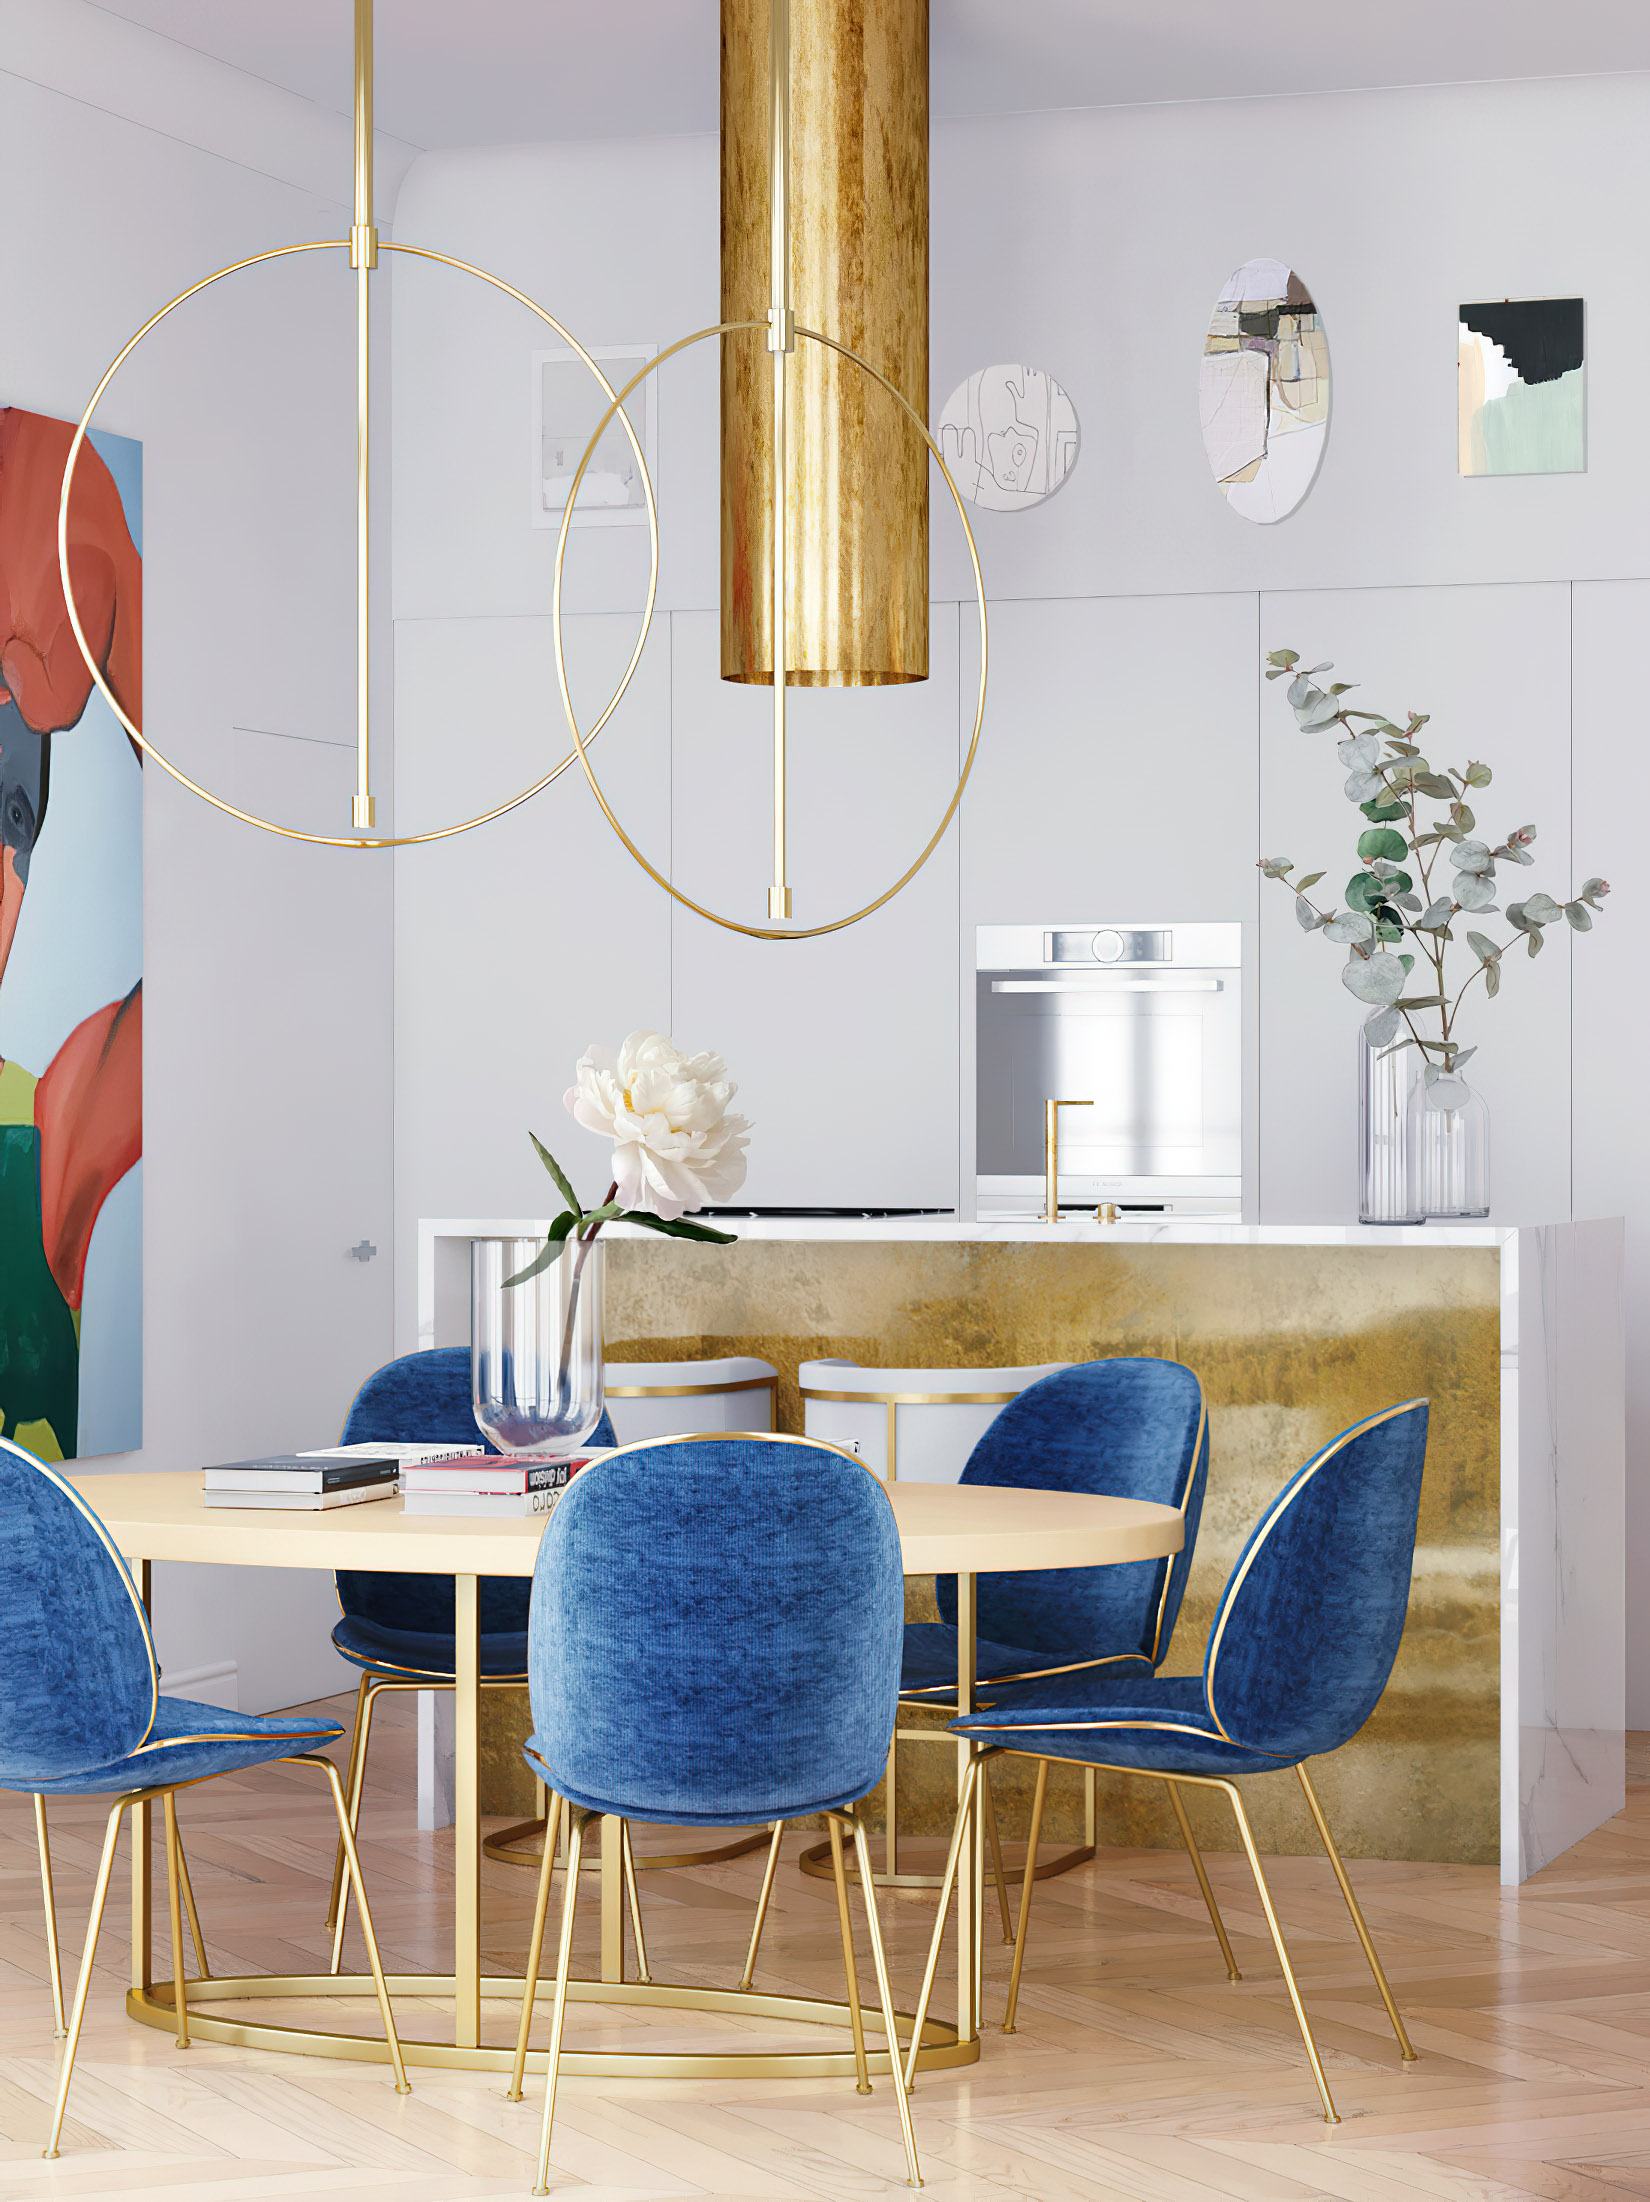 Parisian Apartment Interior Design New York, USA – Harry Nuriev